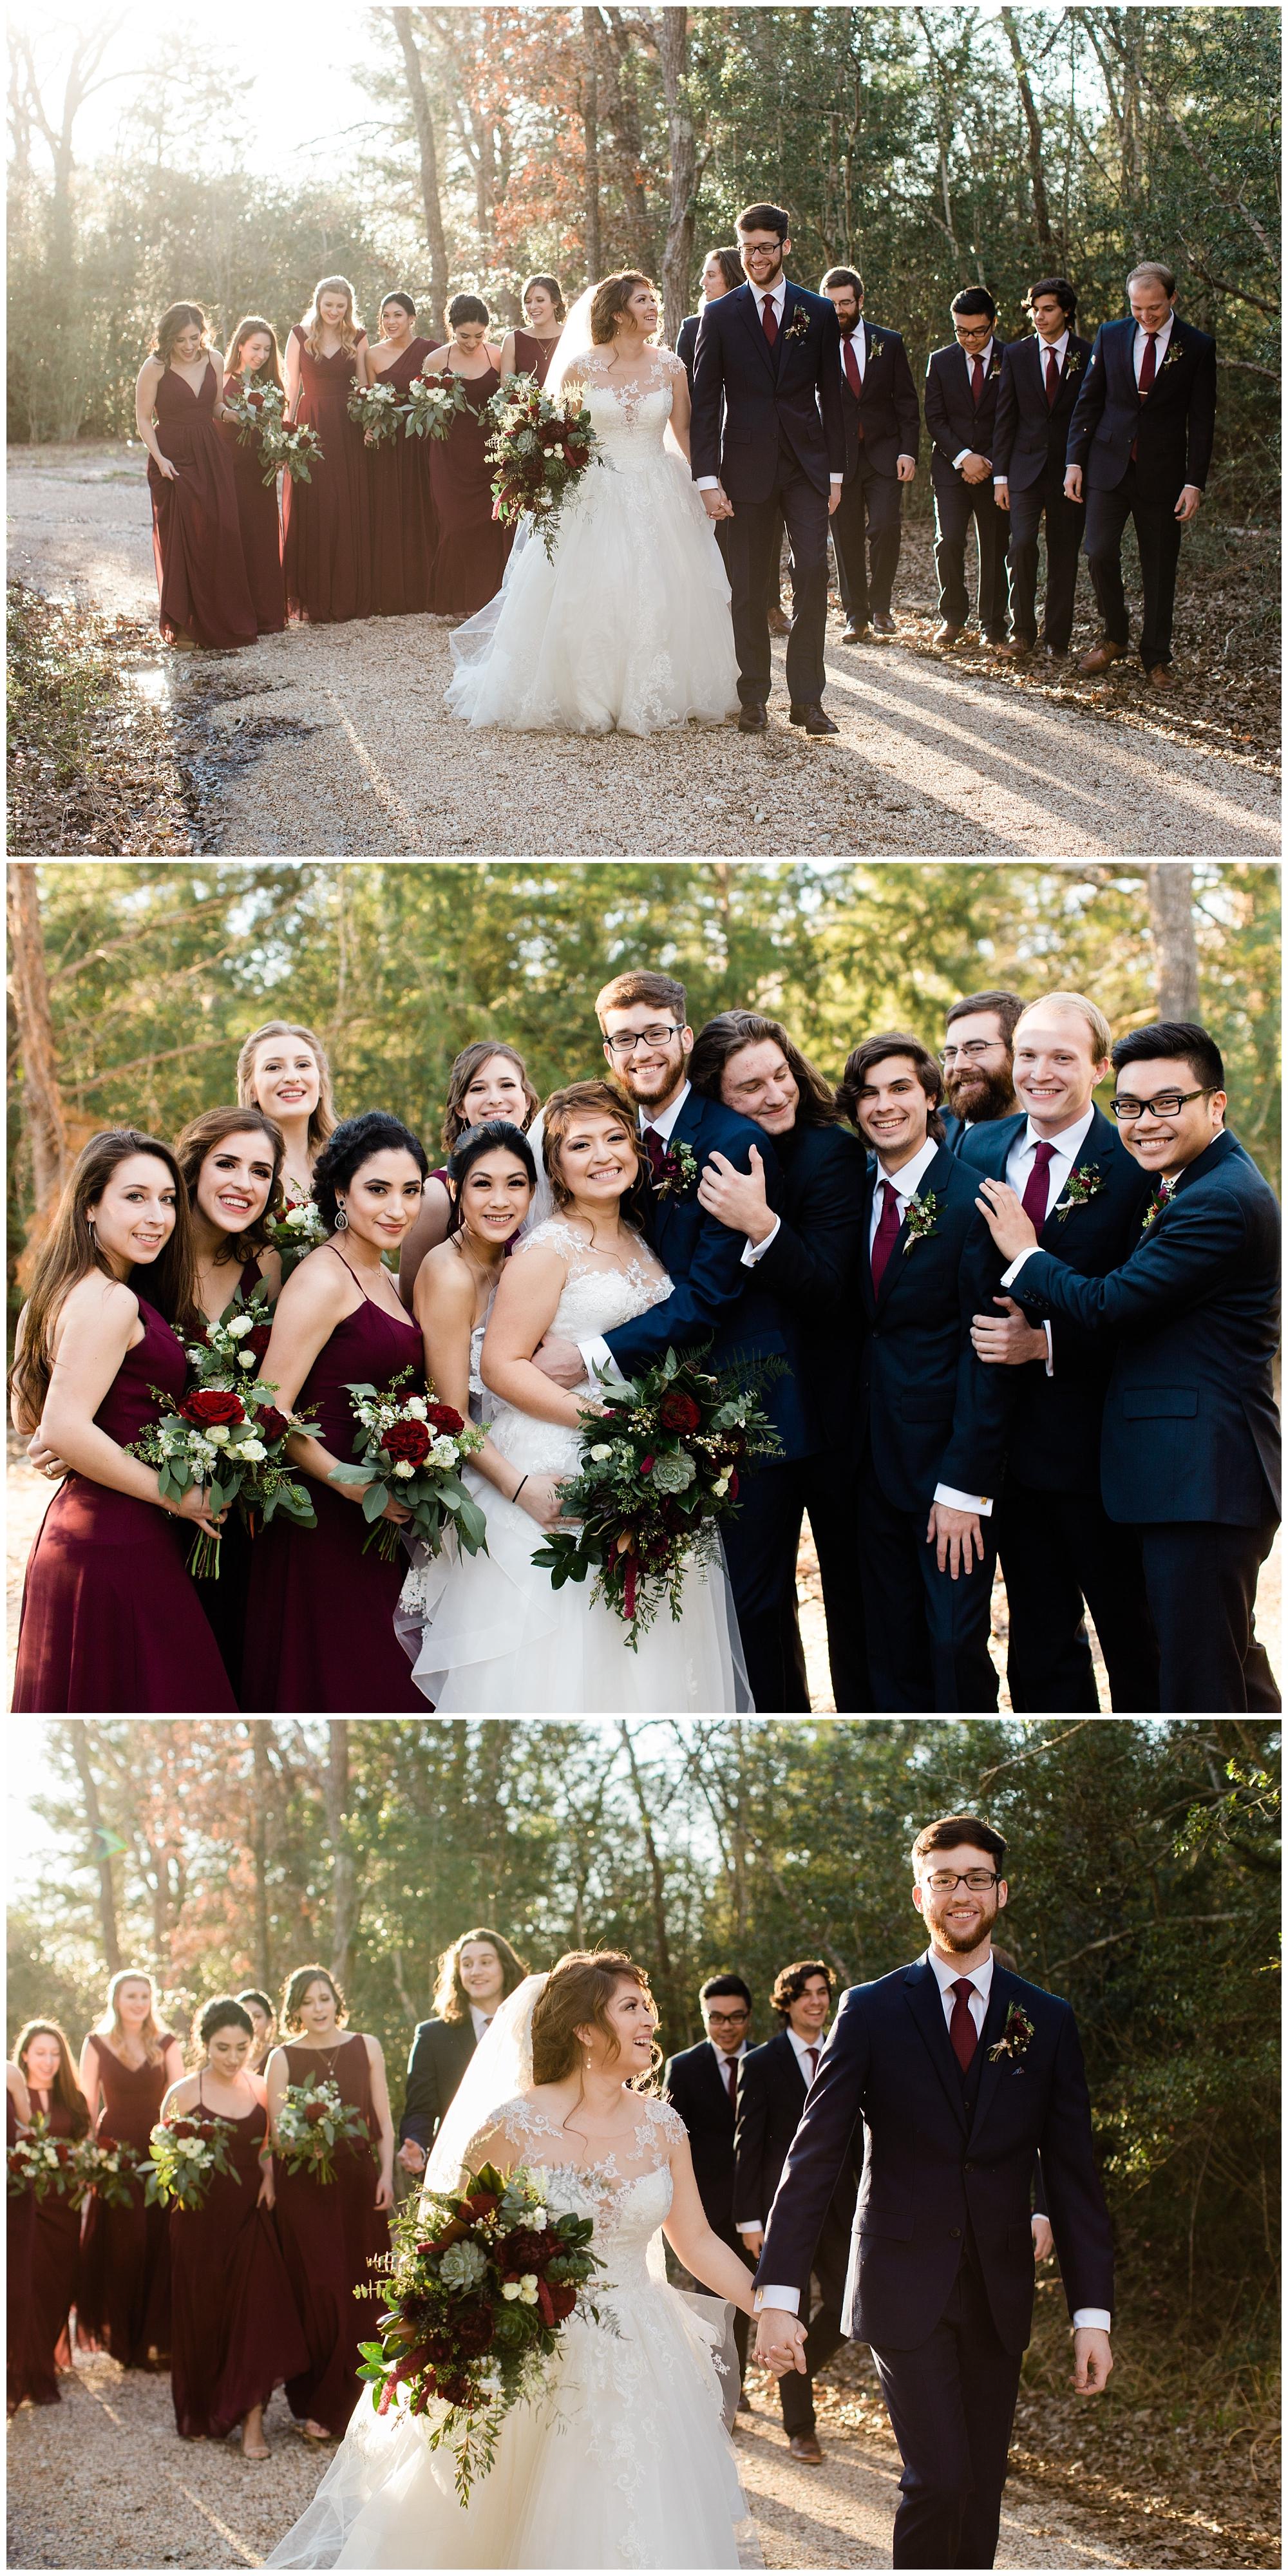 Peach_Creek_Ranch_Wedding_Kristina_Ross_Photography_0020.jpg